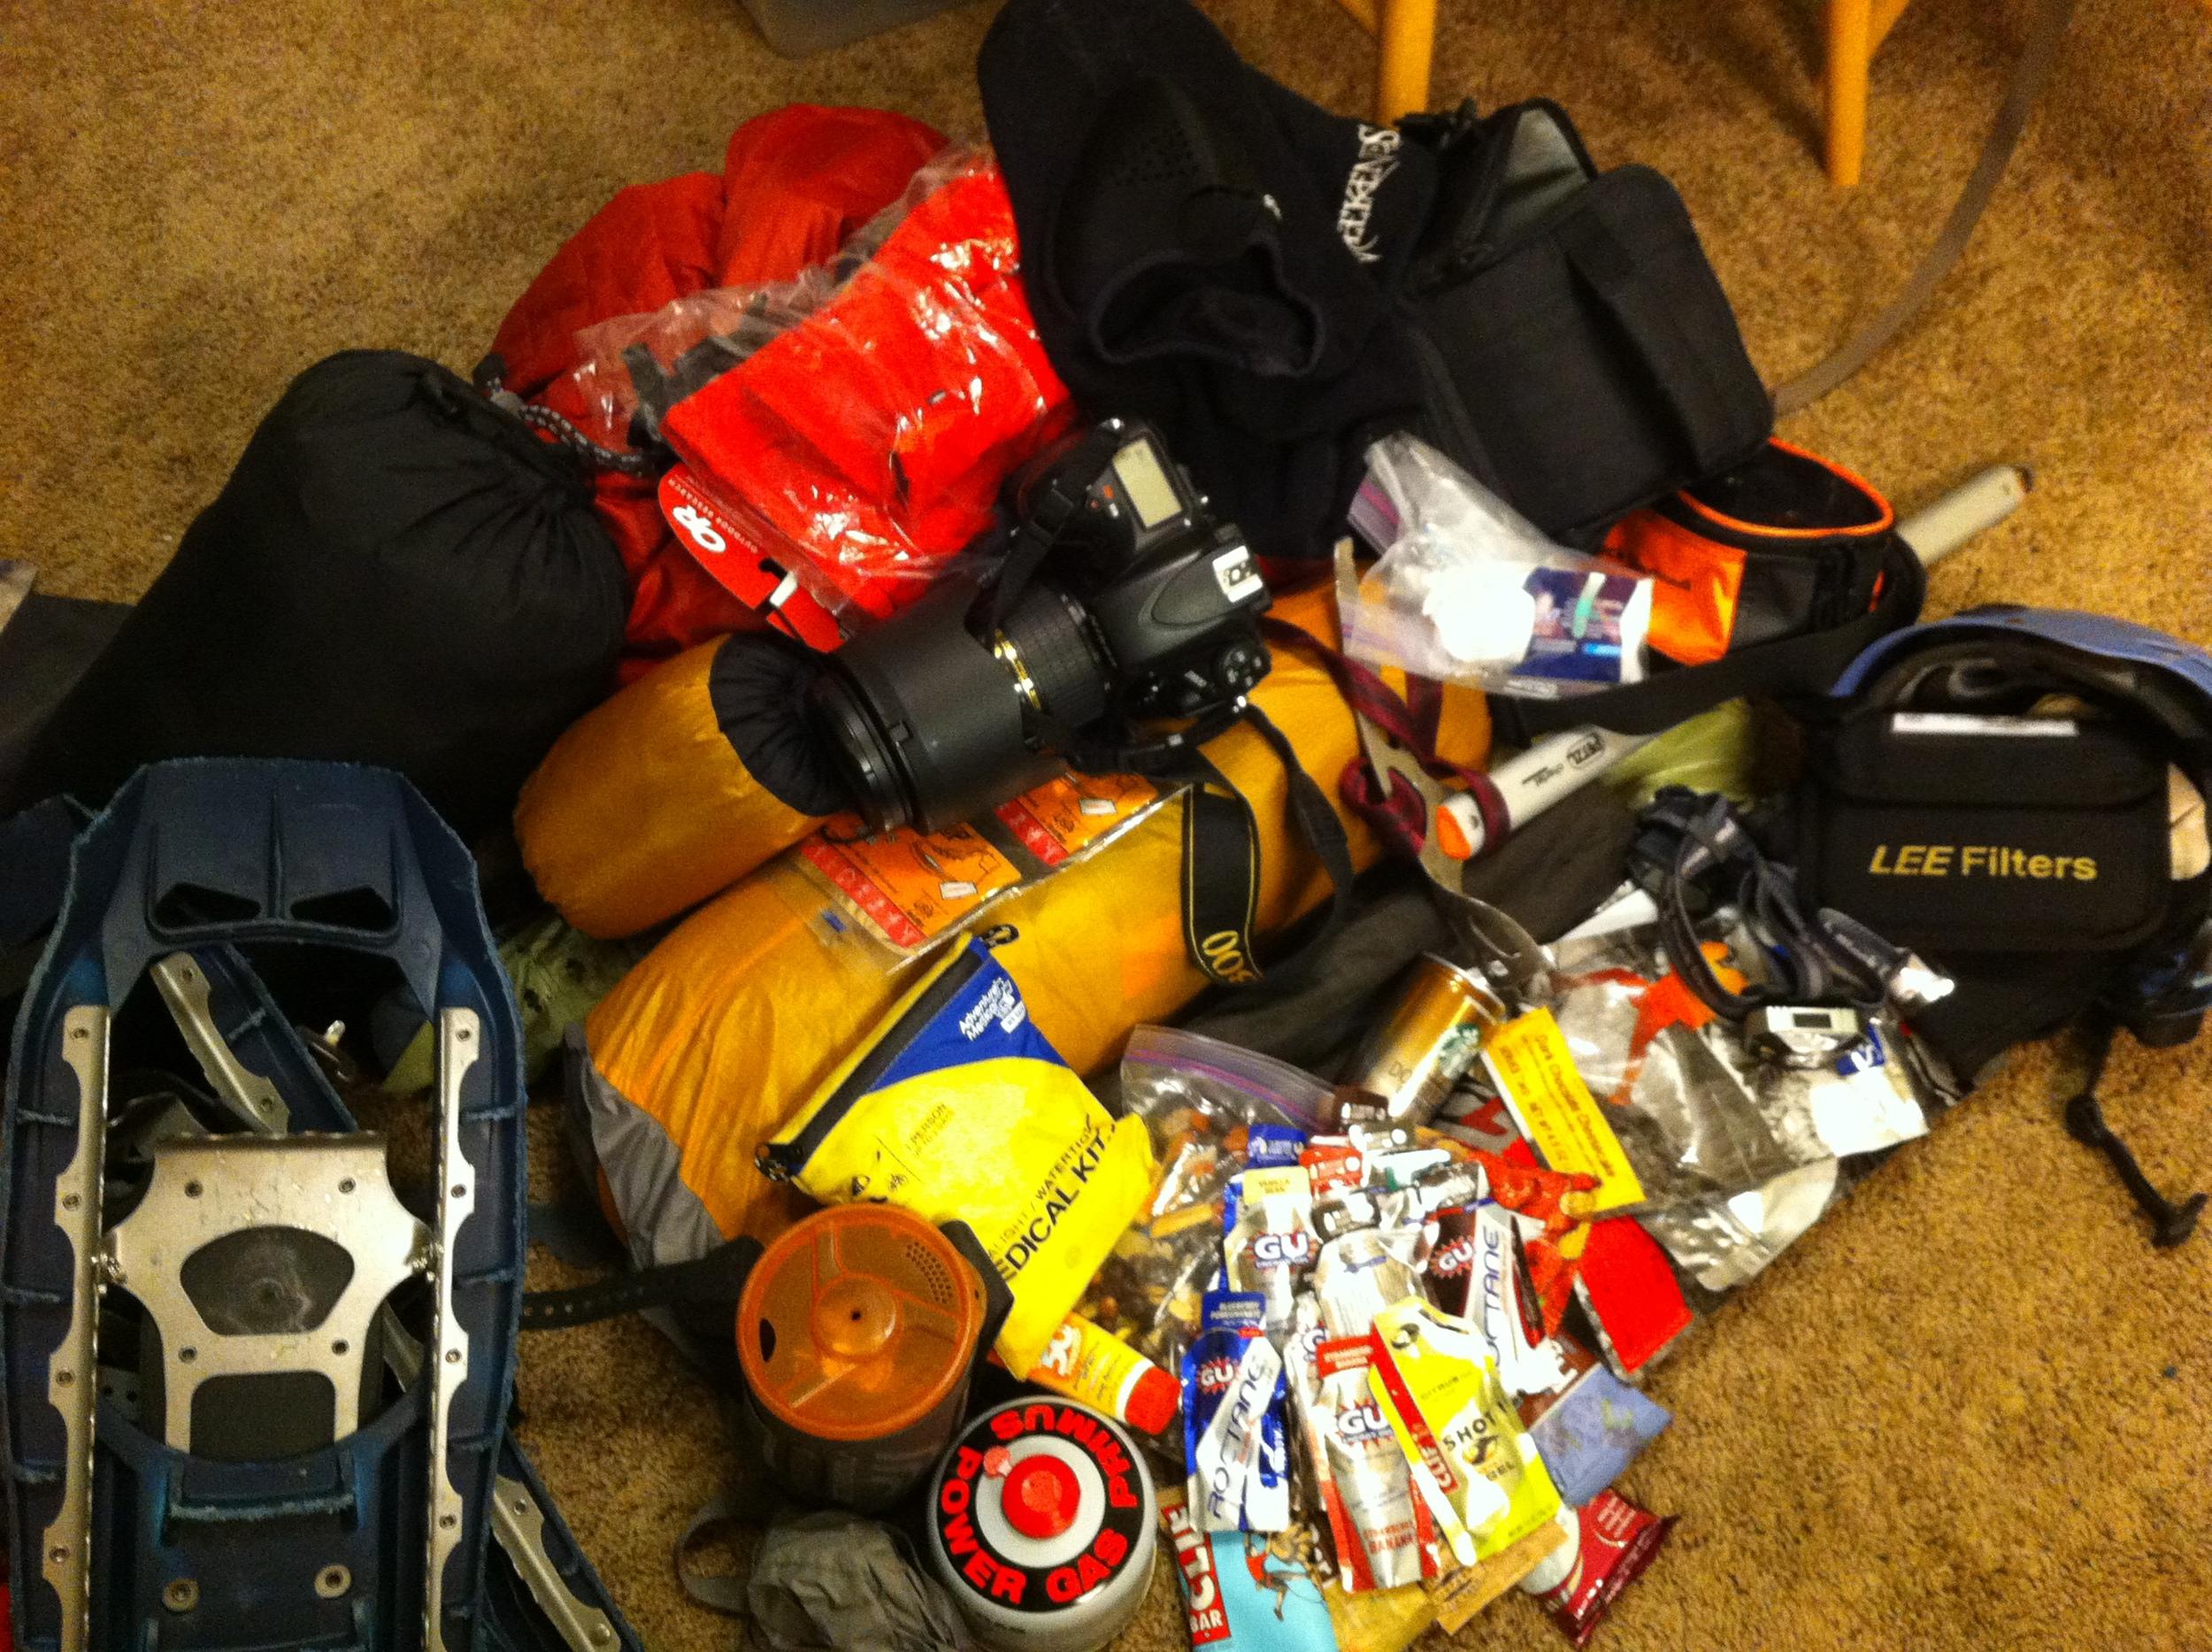 My gear, around 45 lbs.